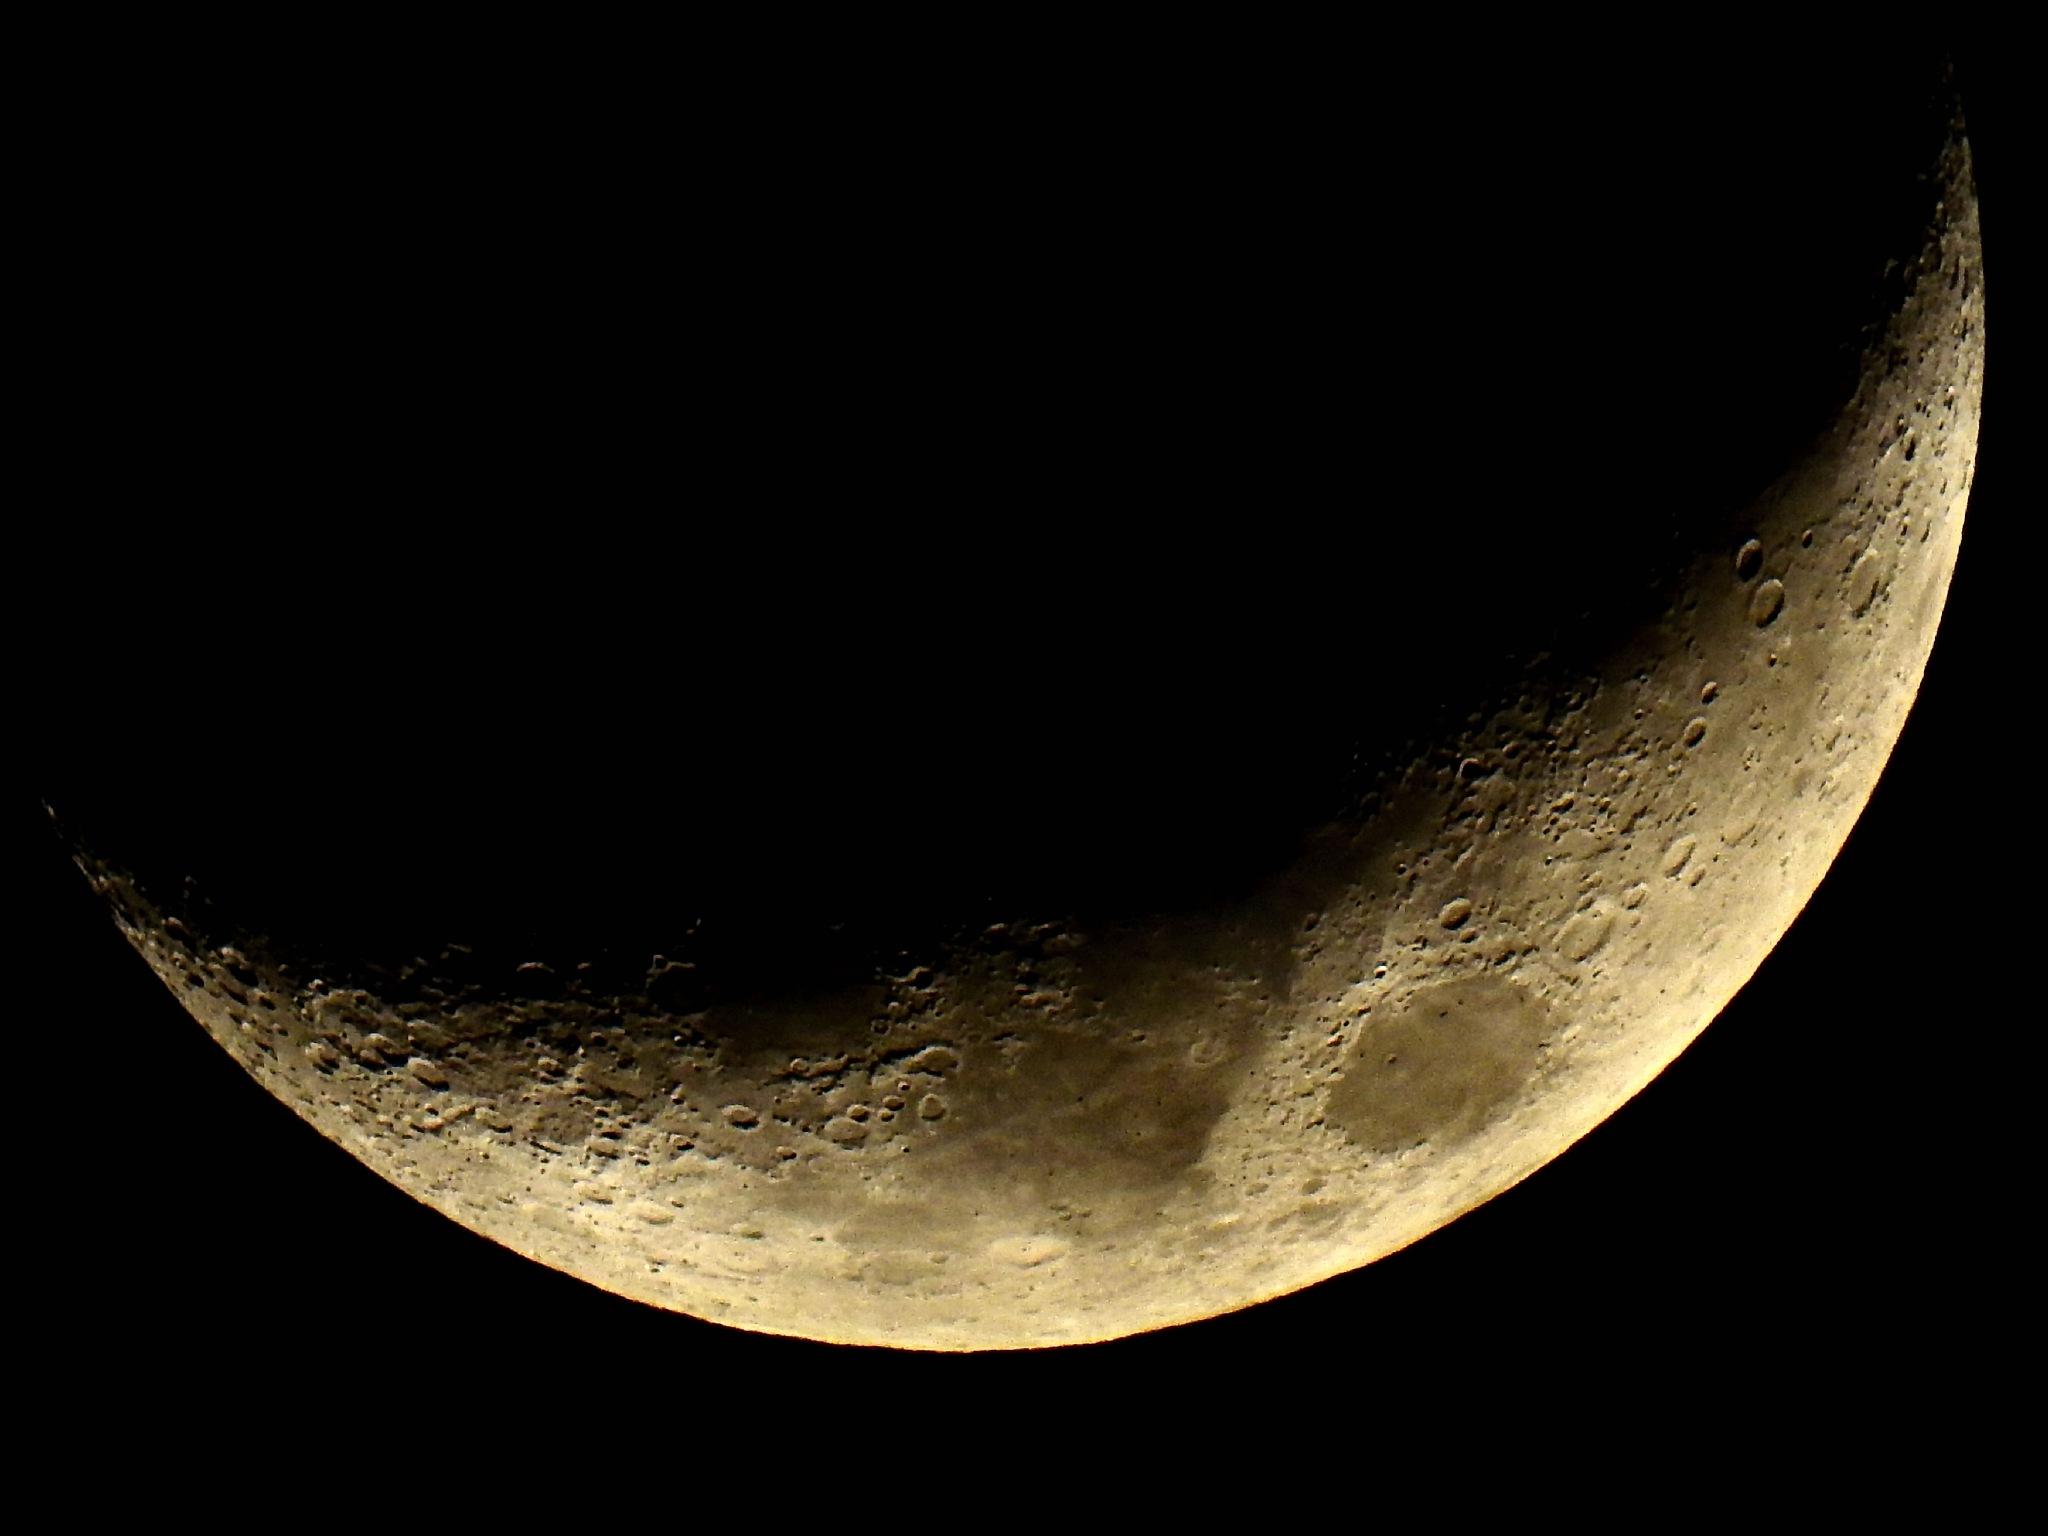 Tonight's Crescent Moon by Patty Stockton